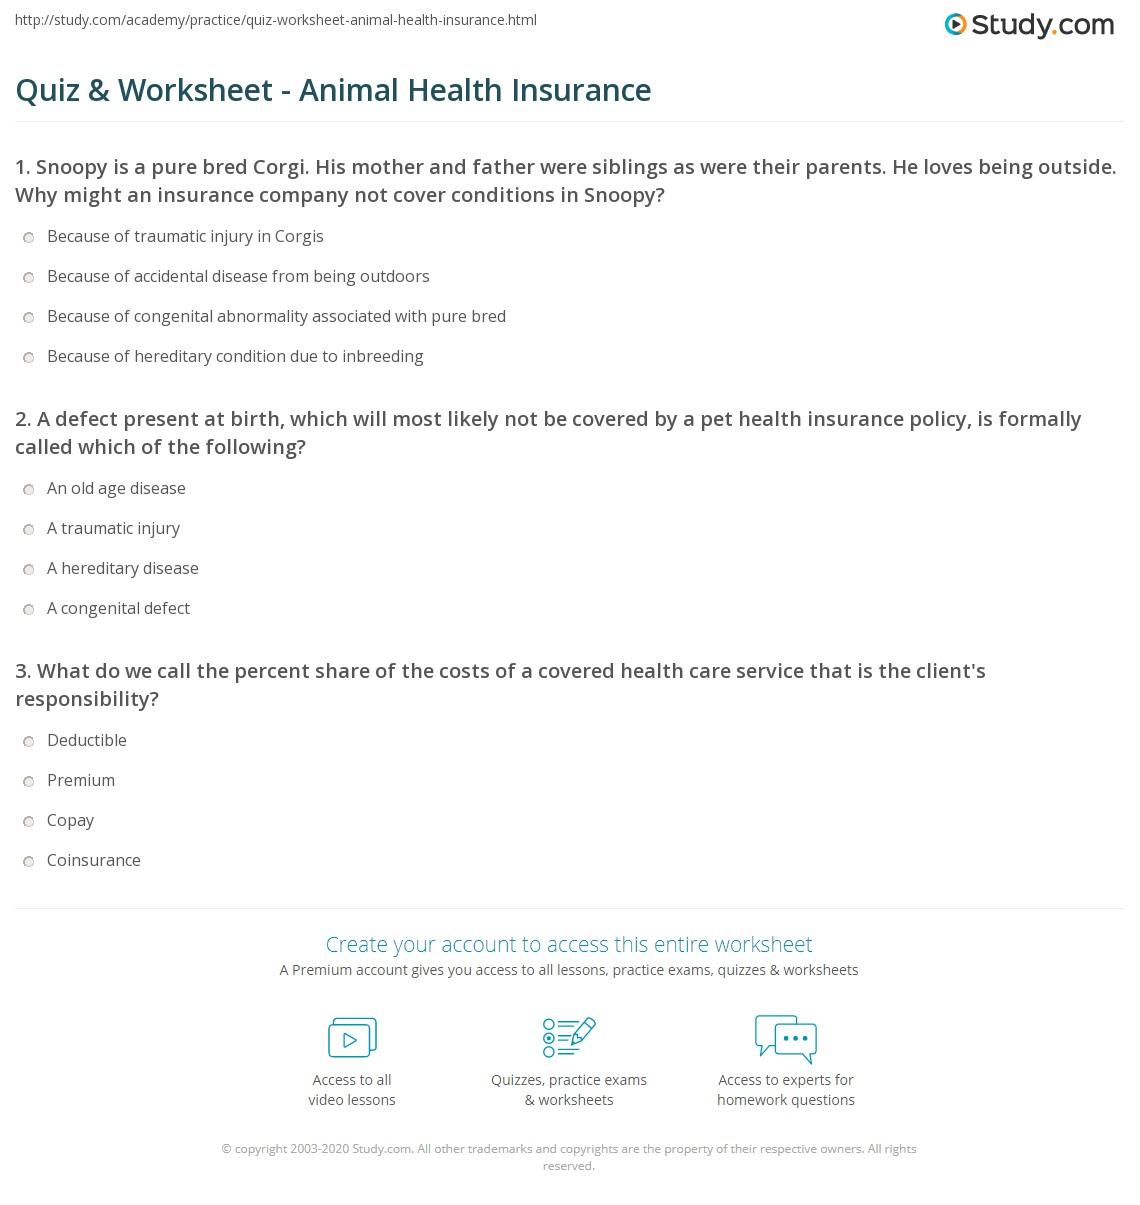 Quiz worksheet animal health insurance study print the basics of pet health insurance worksheet altavistaventures Images